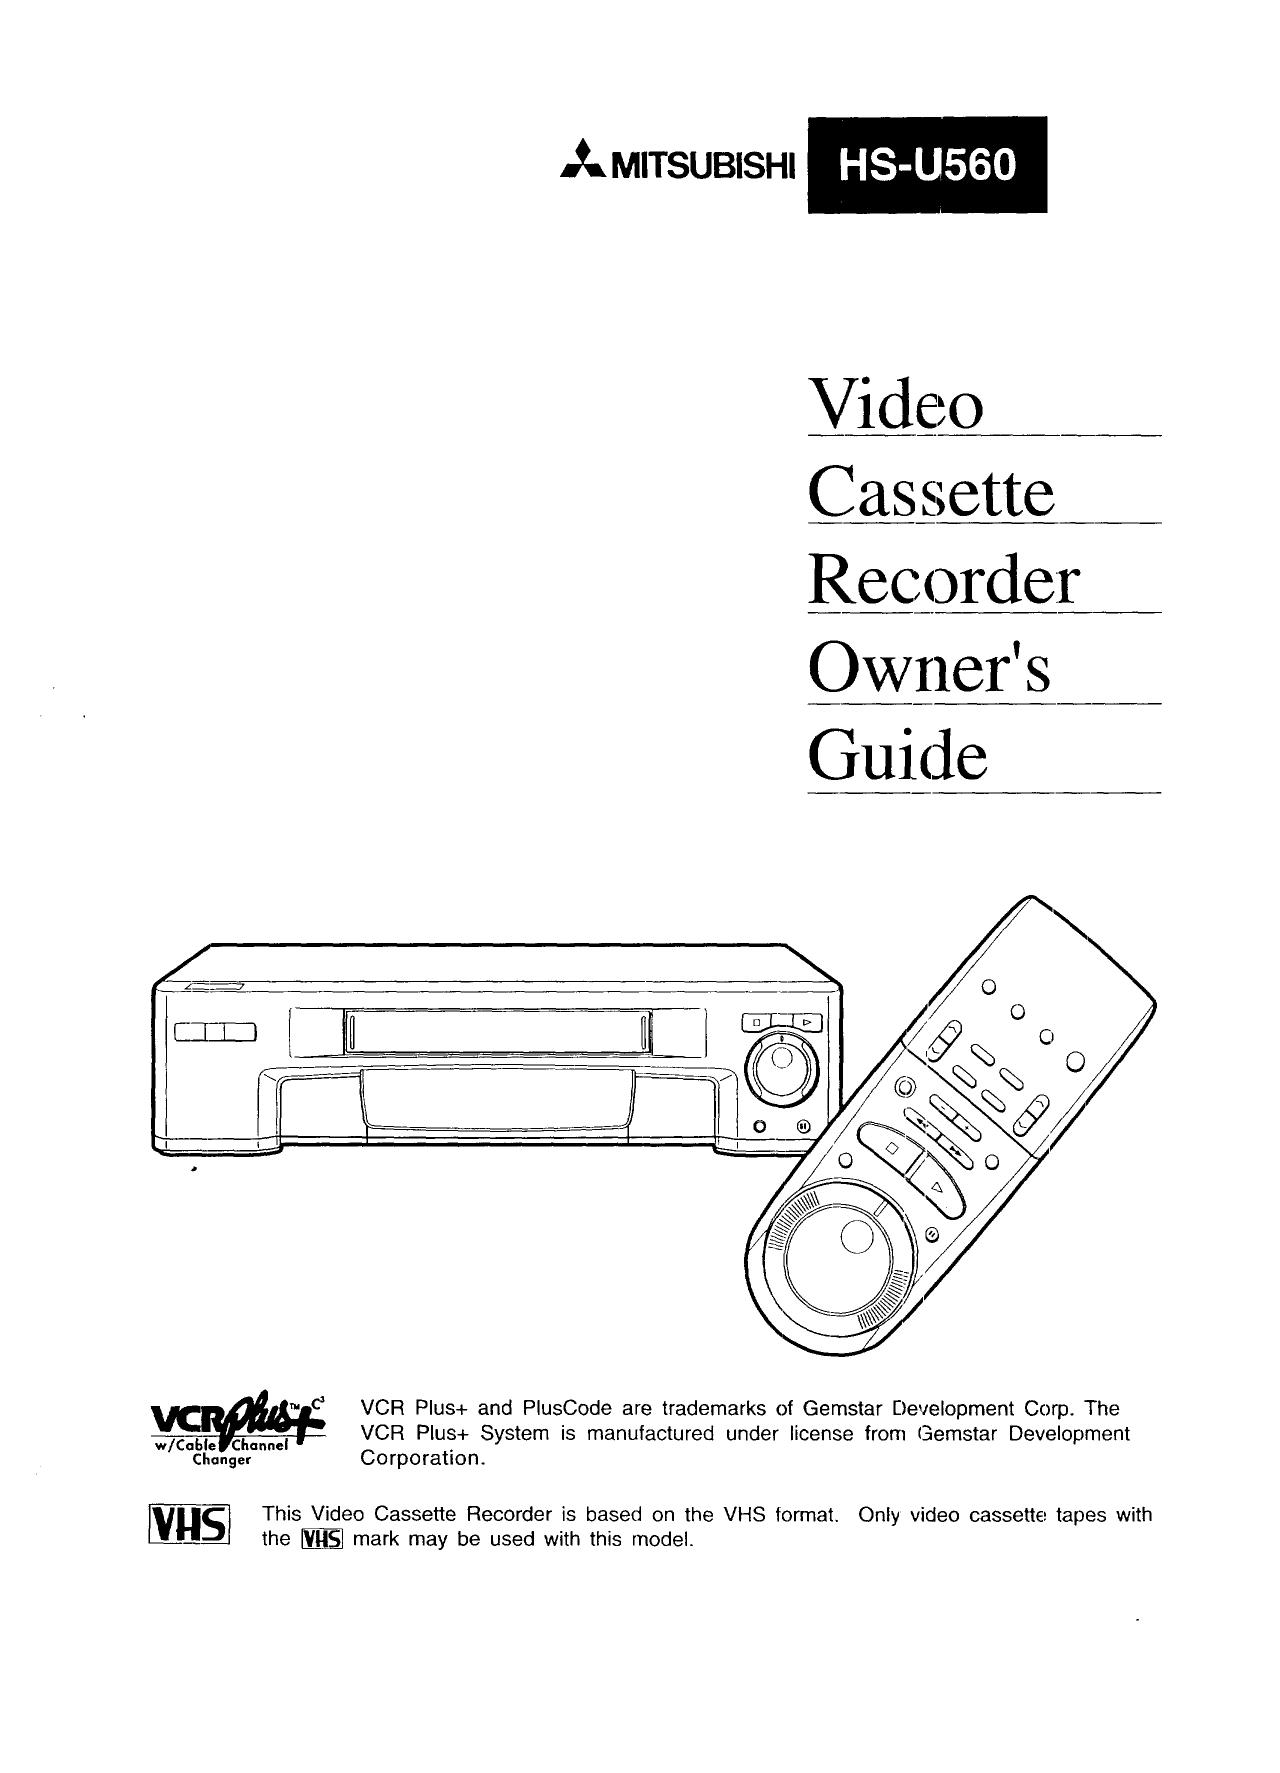 Mitsubishi HSU560C Videocassette Recorder Owner's Manual